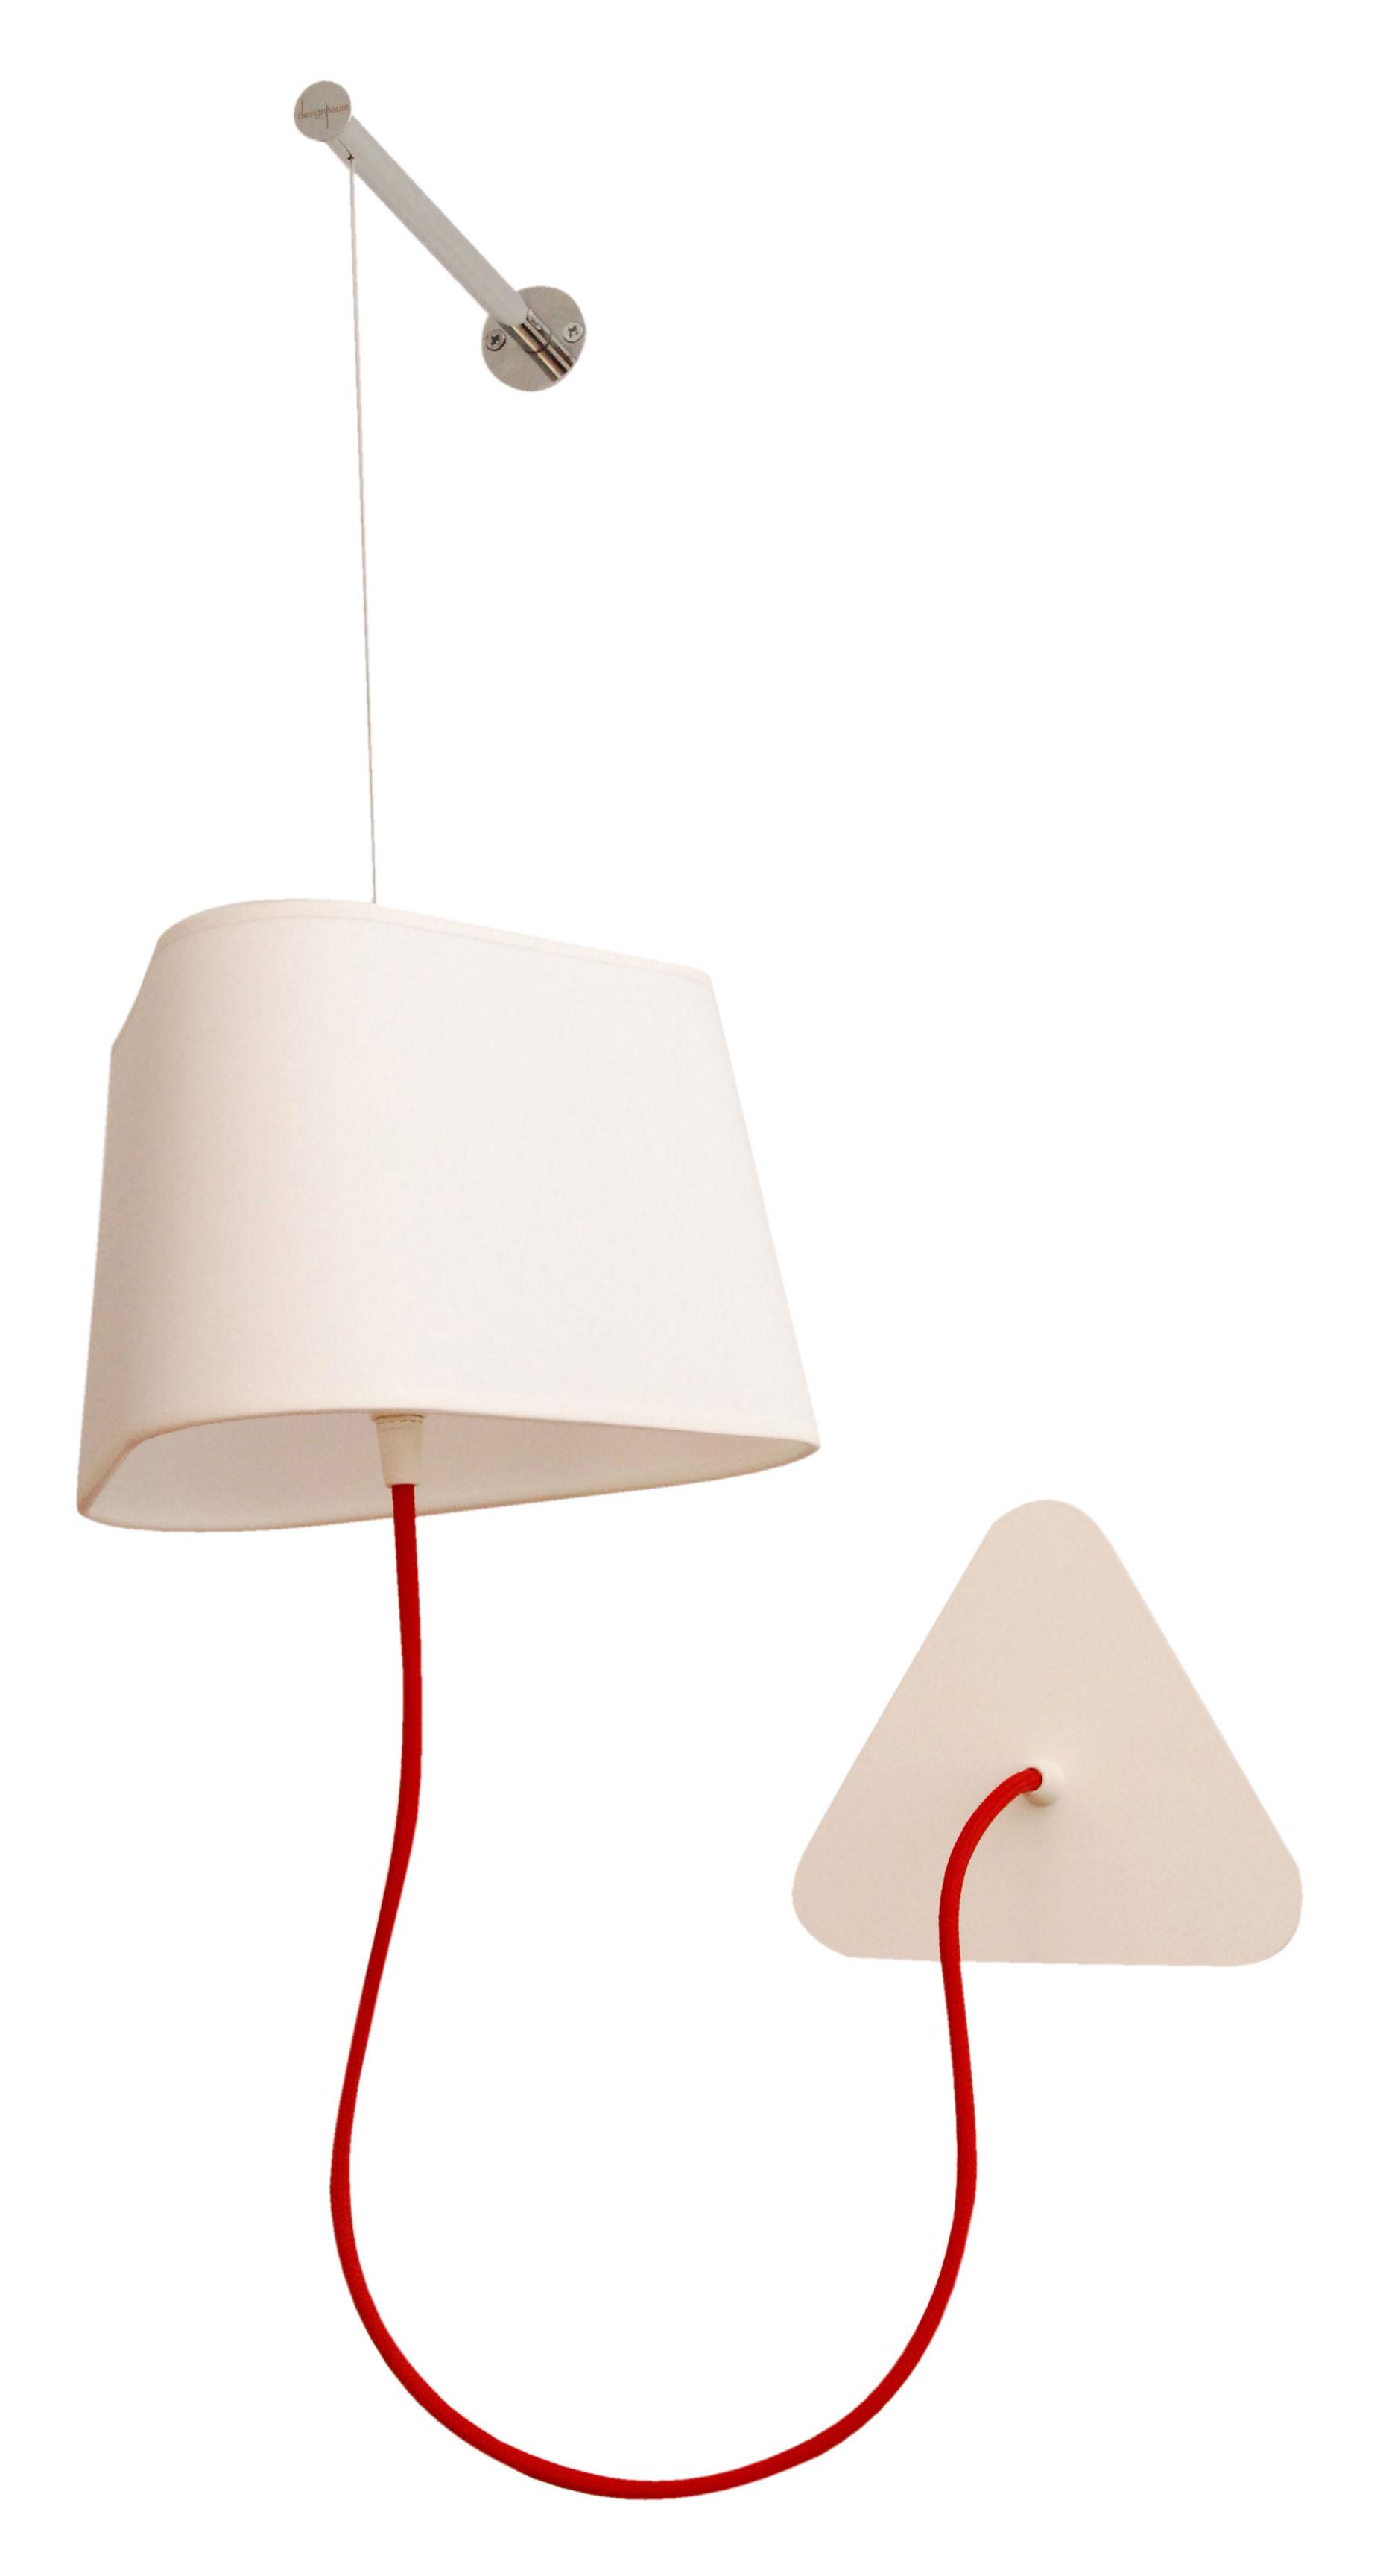 applique petit nuage l 24 cm fixation murale tissu. Black Bedroom Furniture Sets. Home Design Ideas